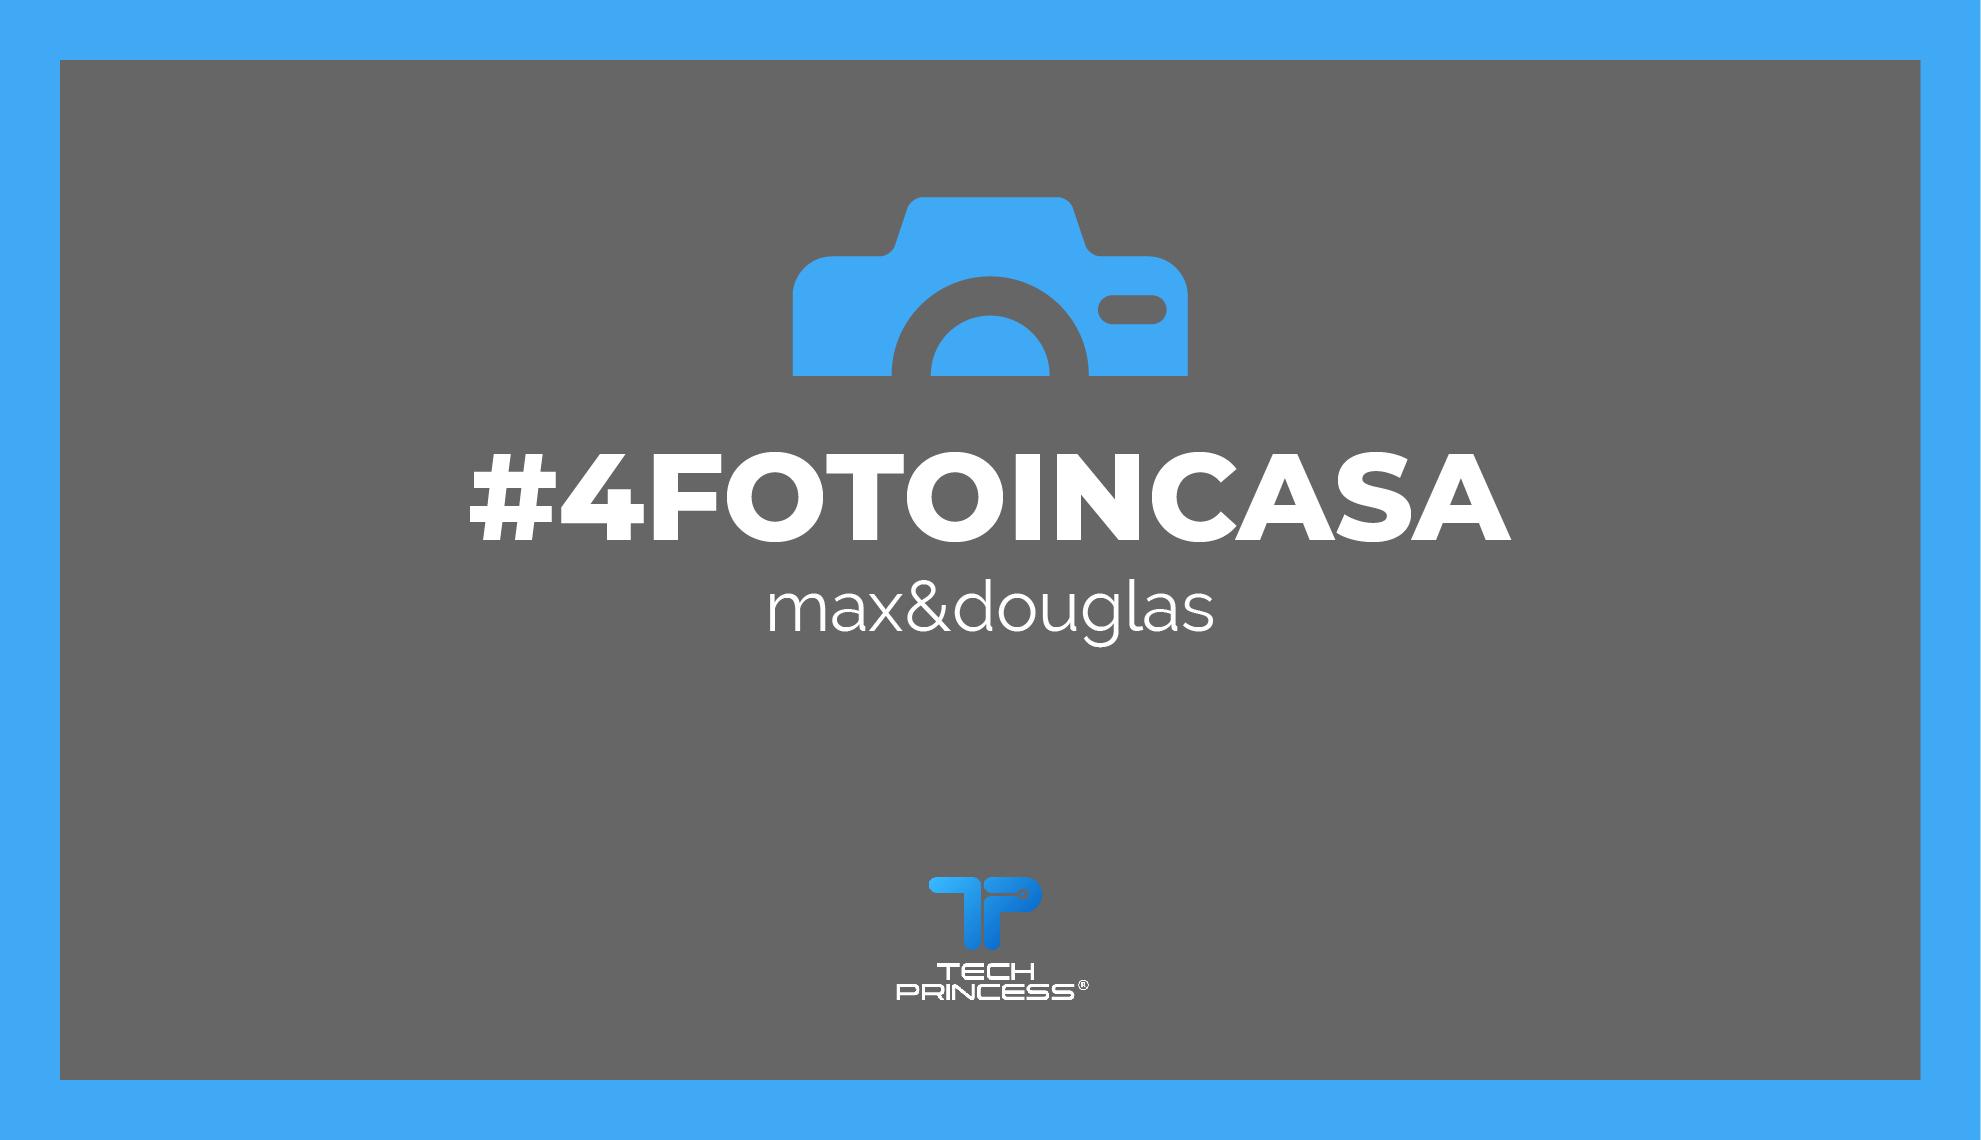 #4fotoincasa, la sfida lanciata da Tech Princess e max&douglas thumbnail